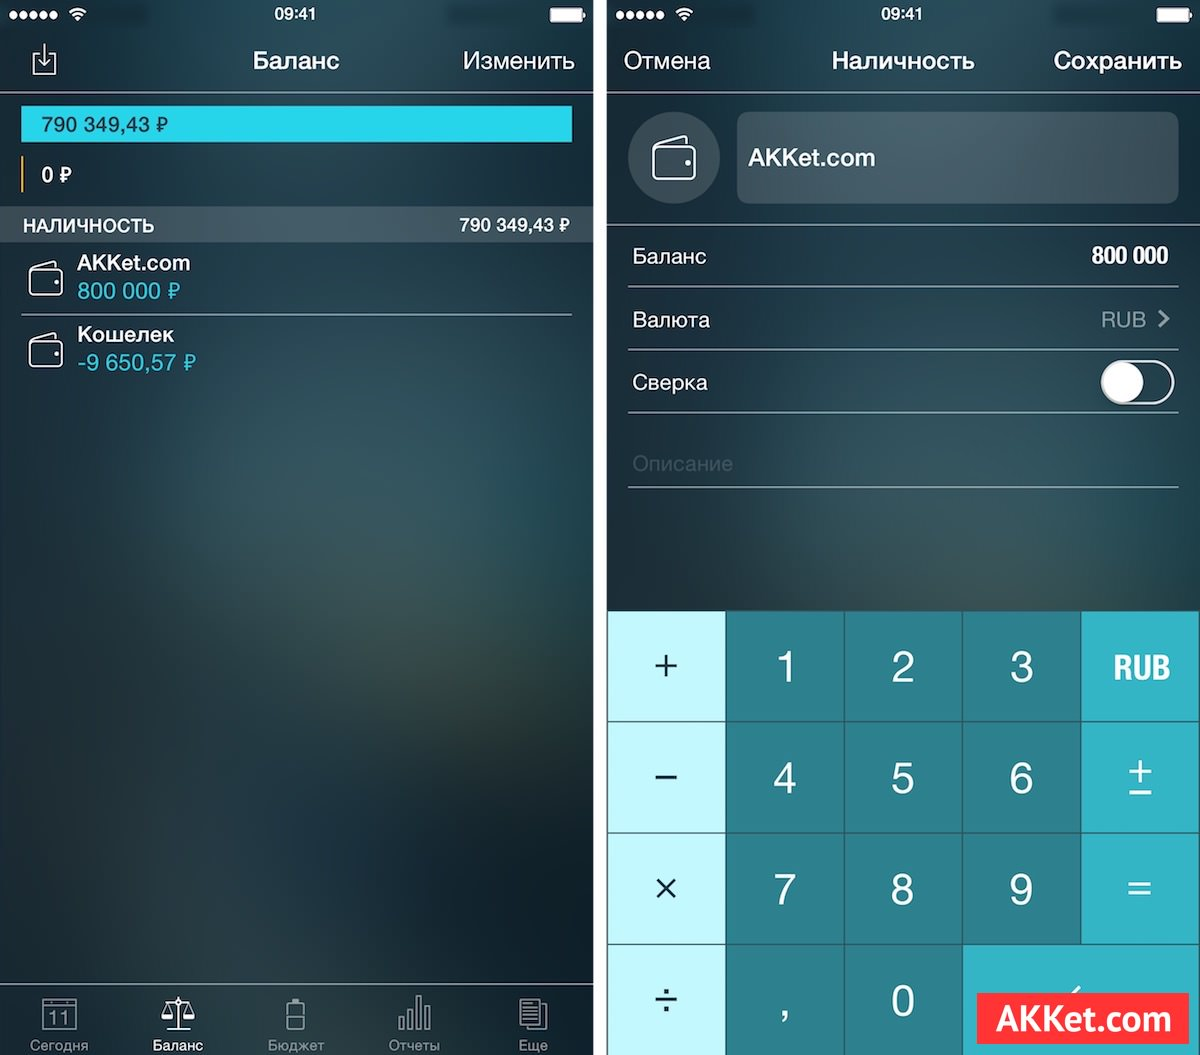 Money Pro akket.com review iOS os x mac iPhone iPad macbook imac pro iPhone 6s plus app store 7